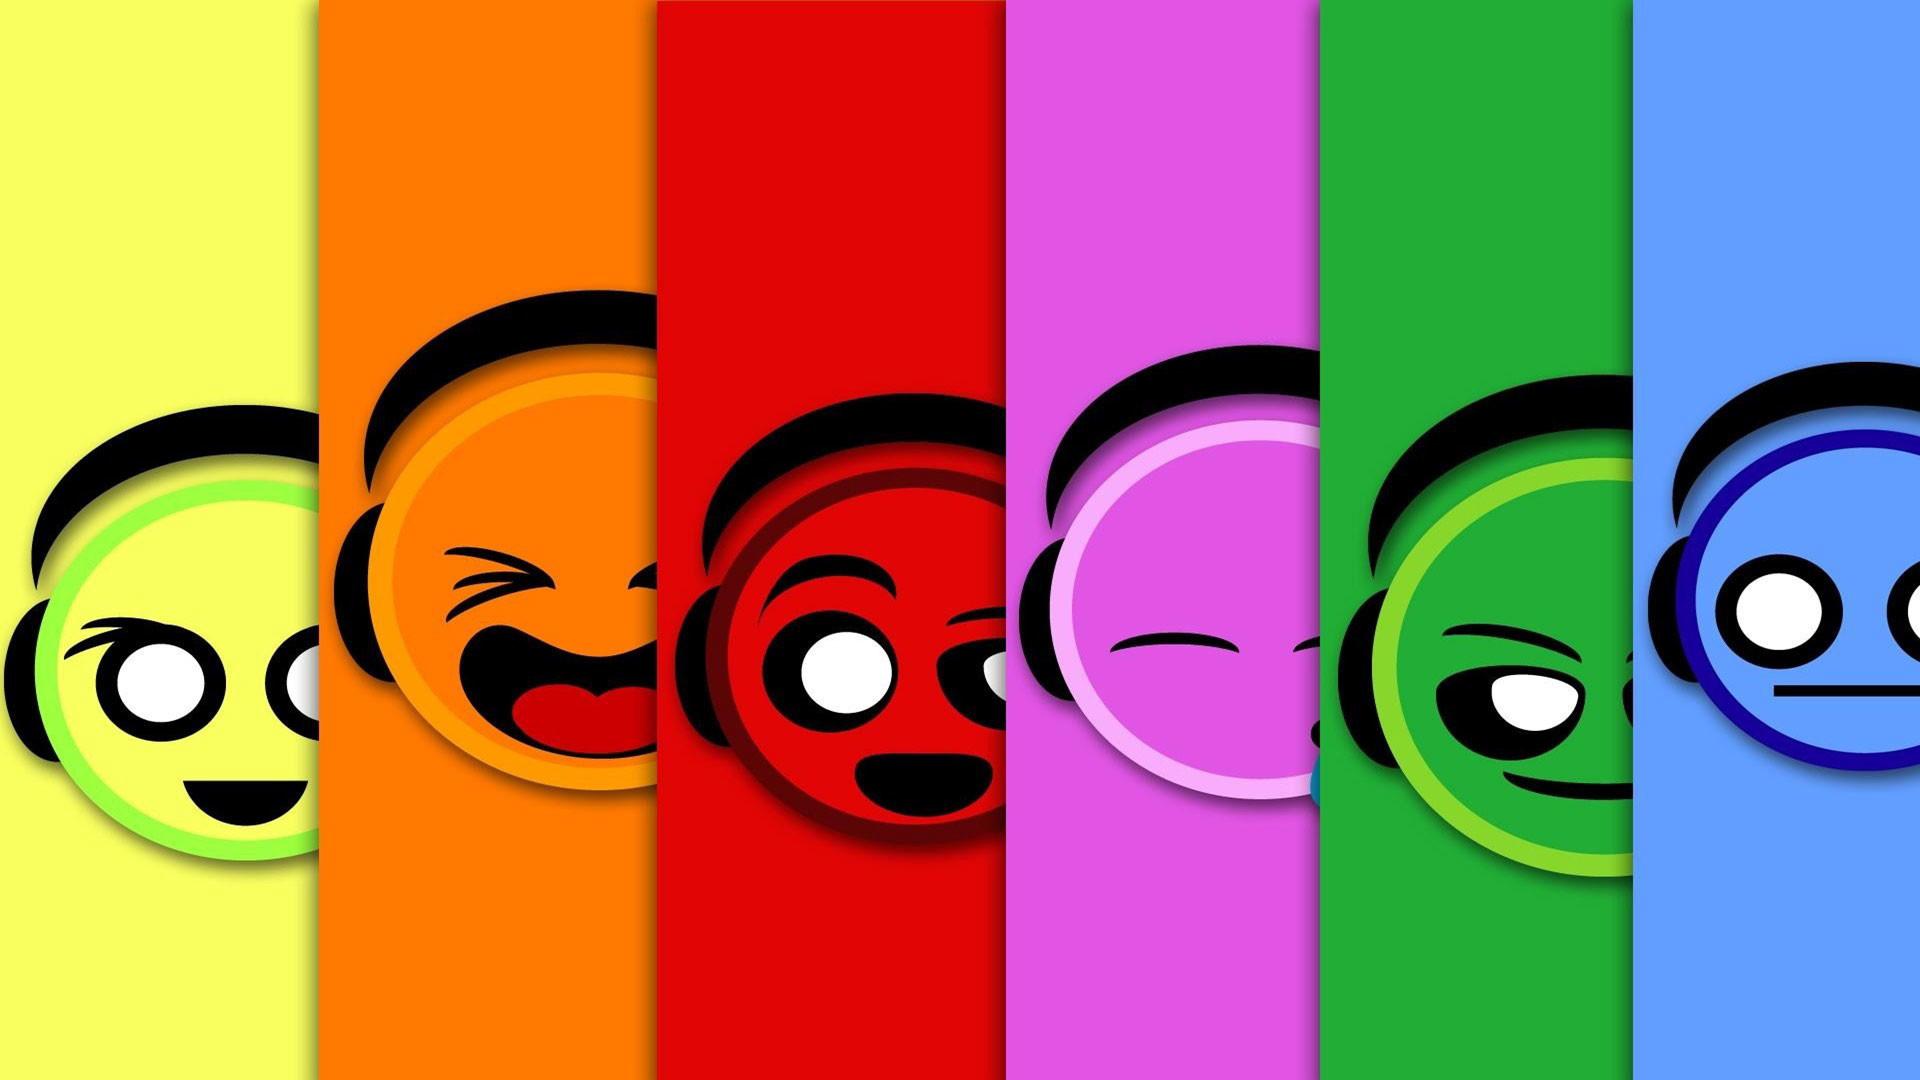 Fantastic Wallpaper Music Emoji - 866812-emojis-wallpapers-1920x1080-ipad  2018_76818.jpg